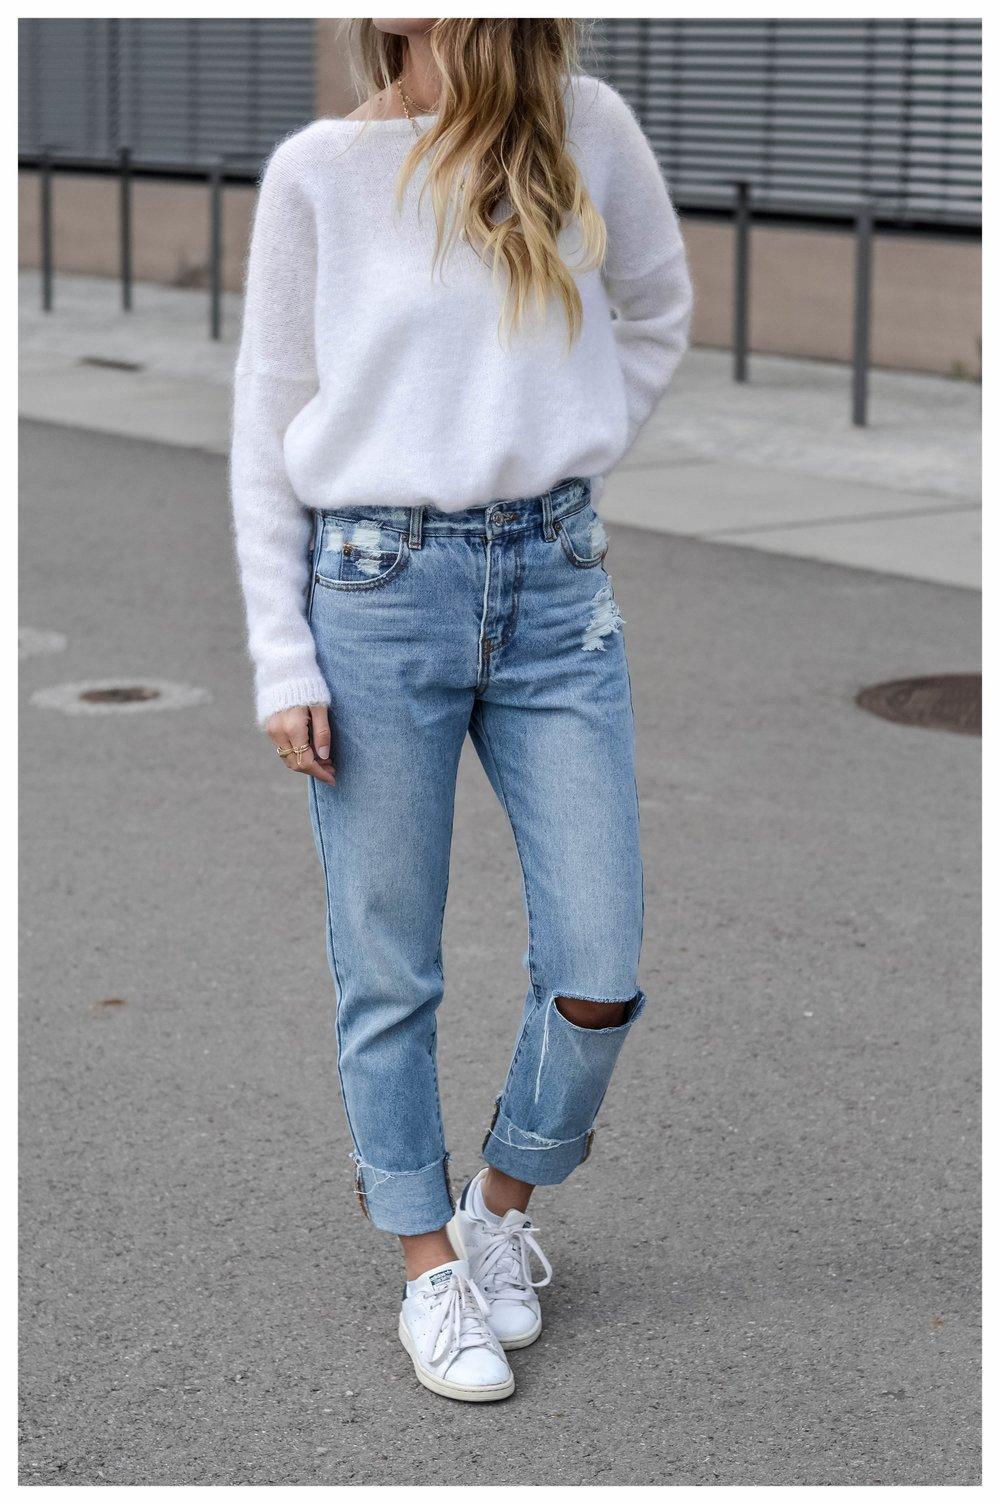 High Jeans - OSIARAH.COM (1 sur 21).jpg